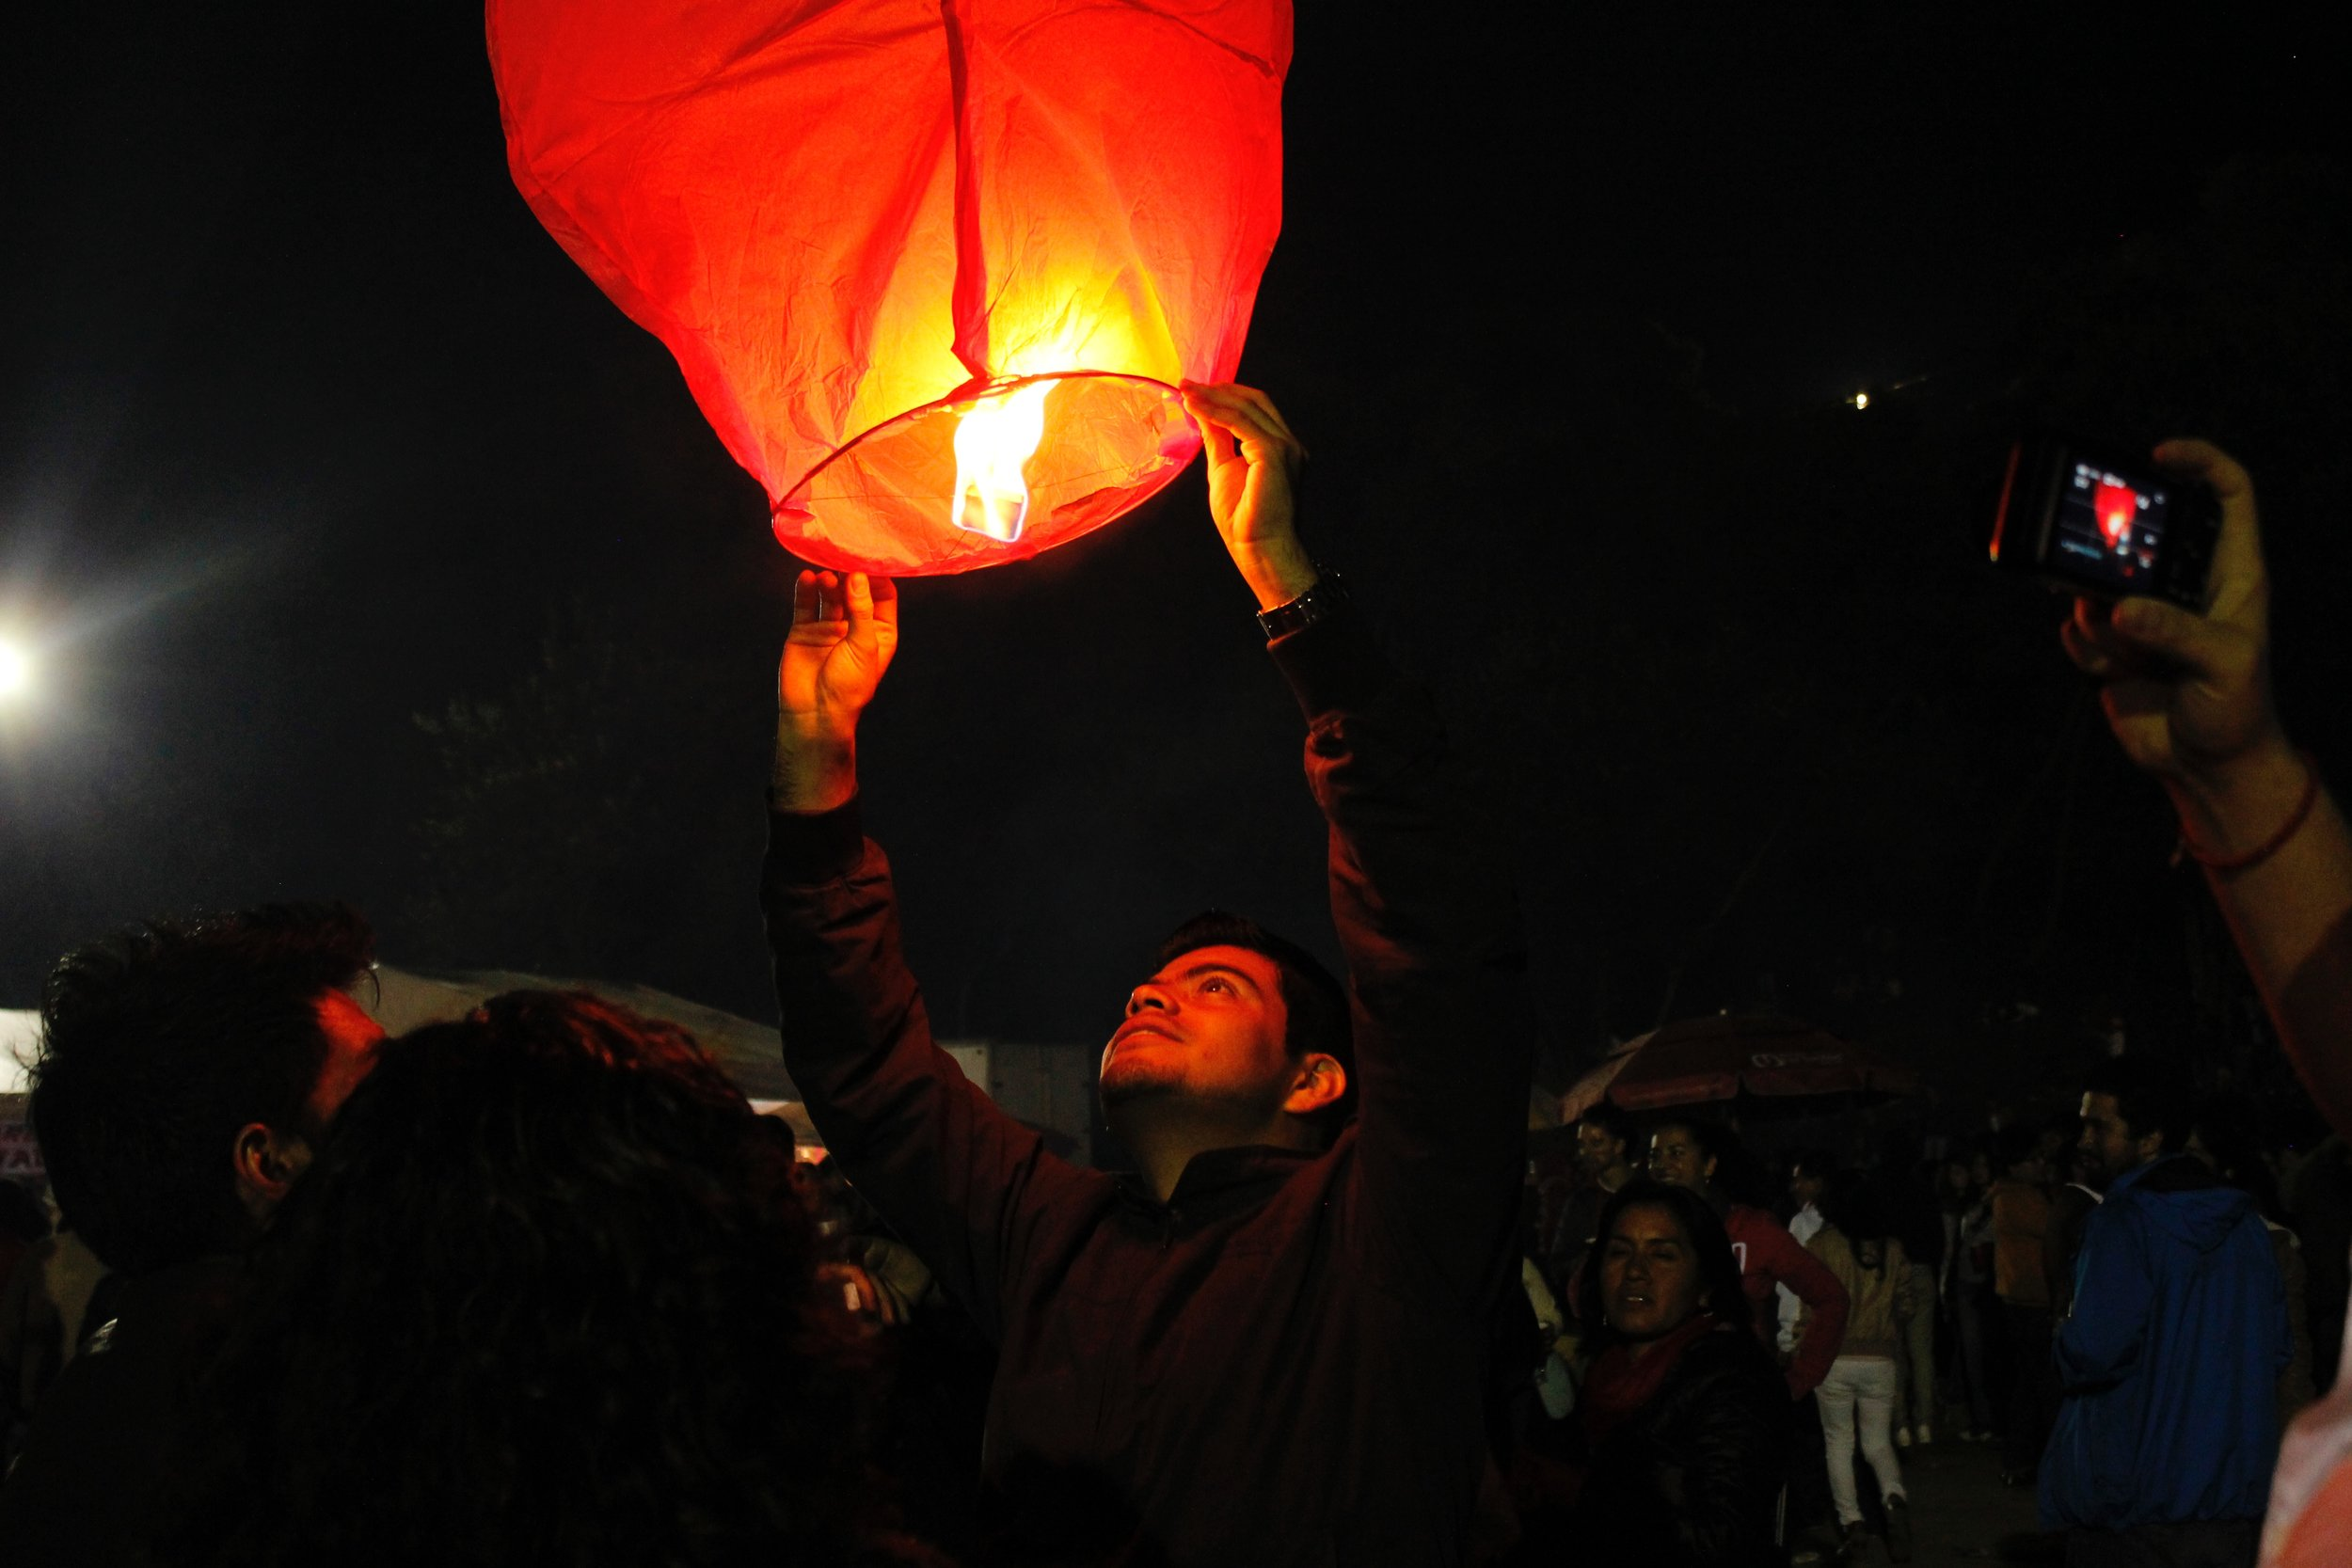 light balloon everardo-sanchez-946-unsplash.jpg